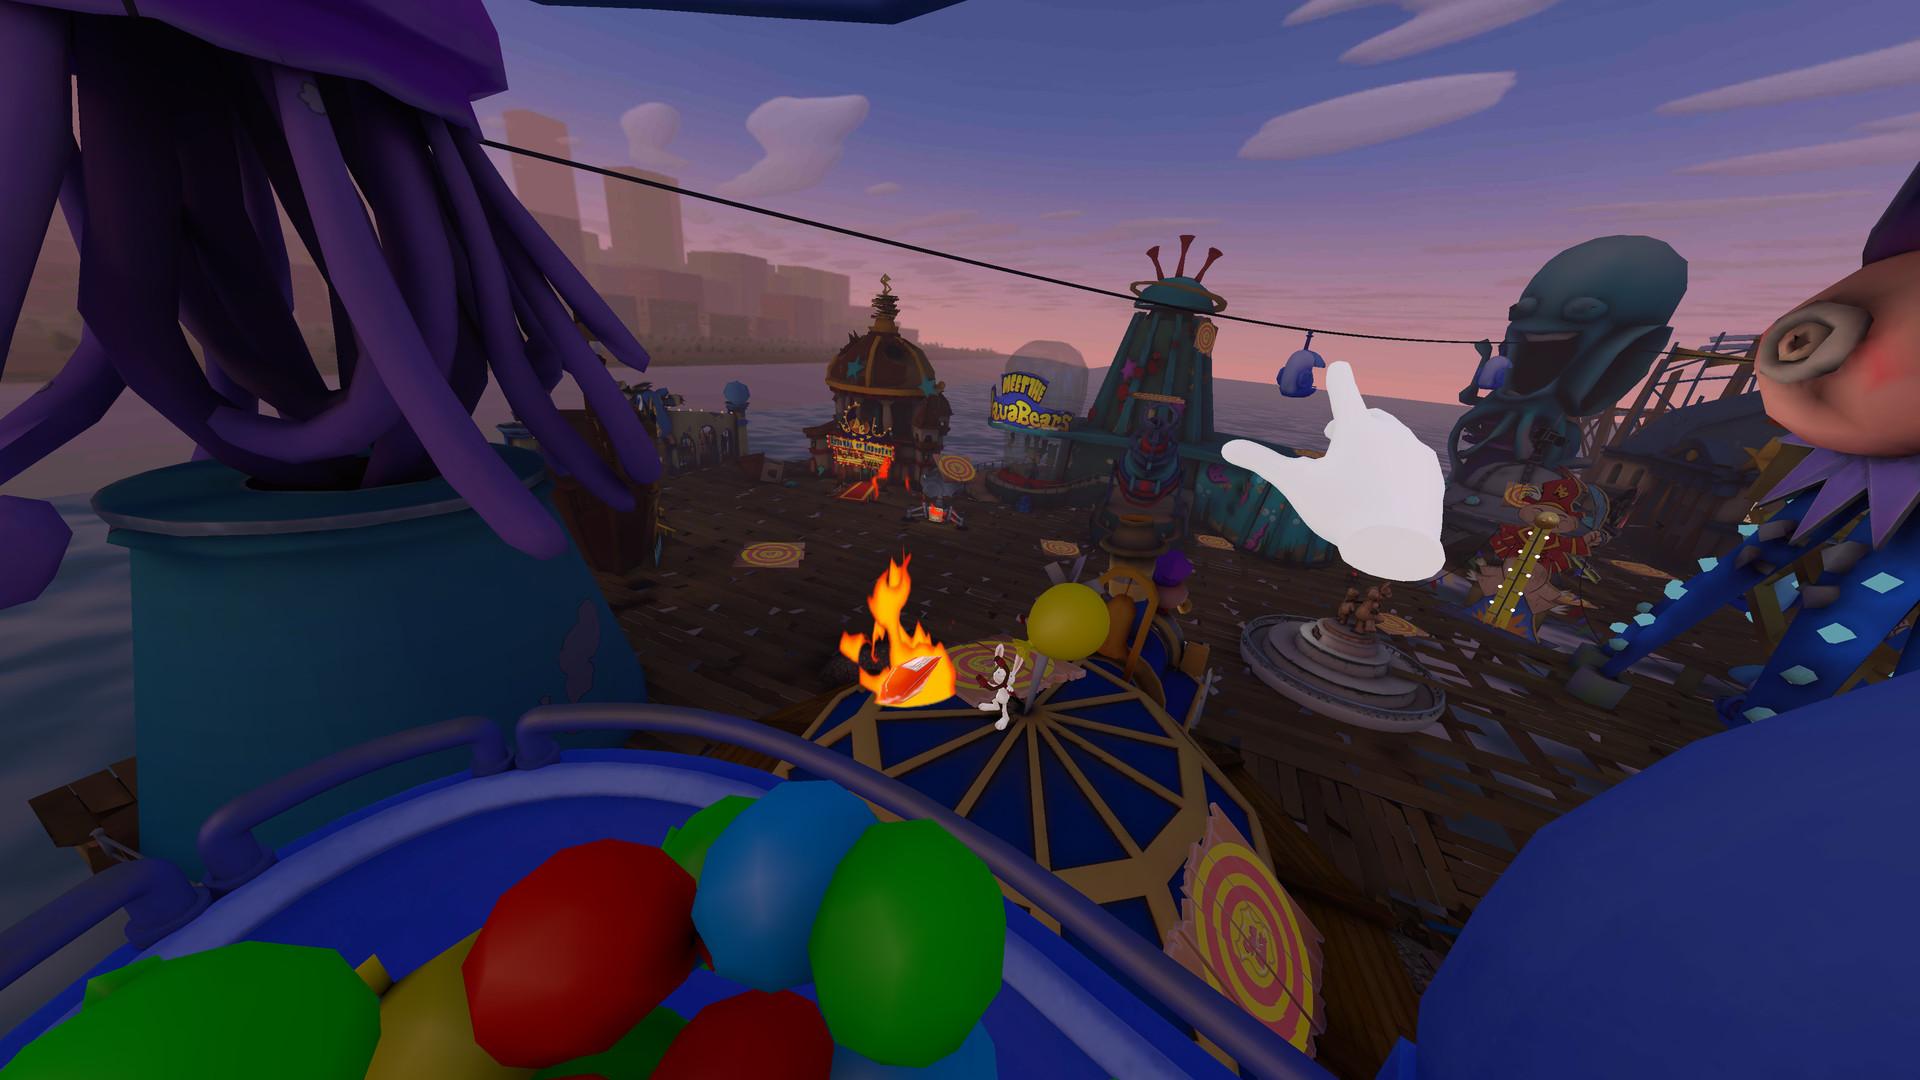 Oculus Quest 游戏《Sam & Max: This Time It's Virtual!》山姆和麦克斯:虚拟警探插图(2)